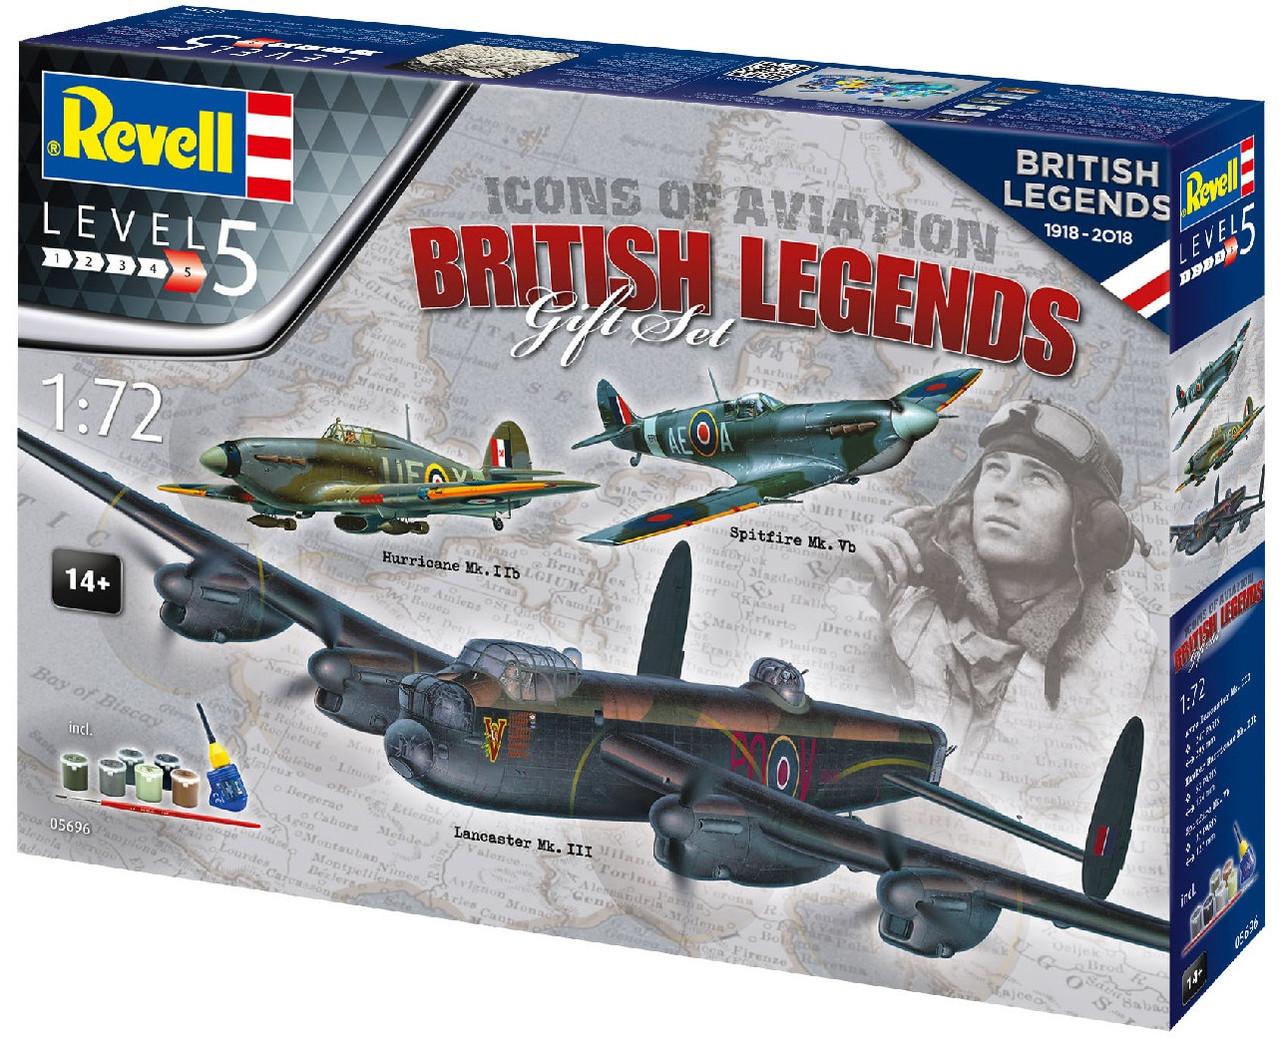 Сборная модель-копия Revell набор Авиа Легенды Британии уровень 5 масштаб 1:72 (RVL-05696)